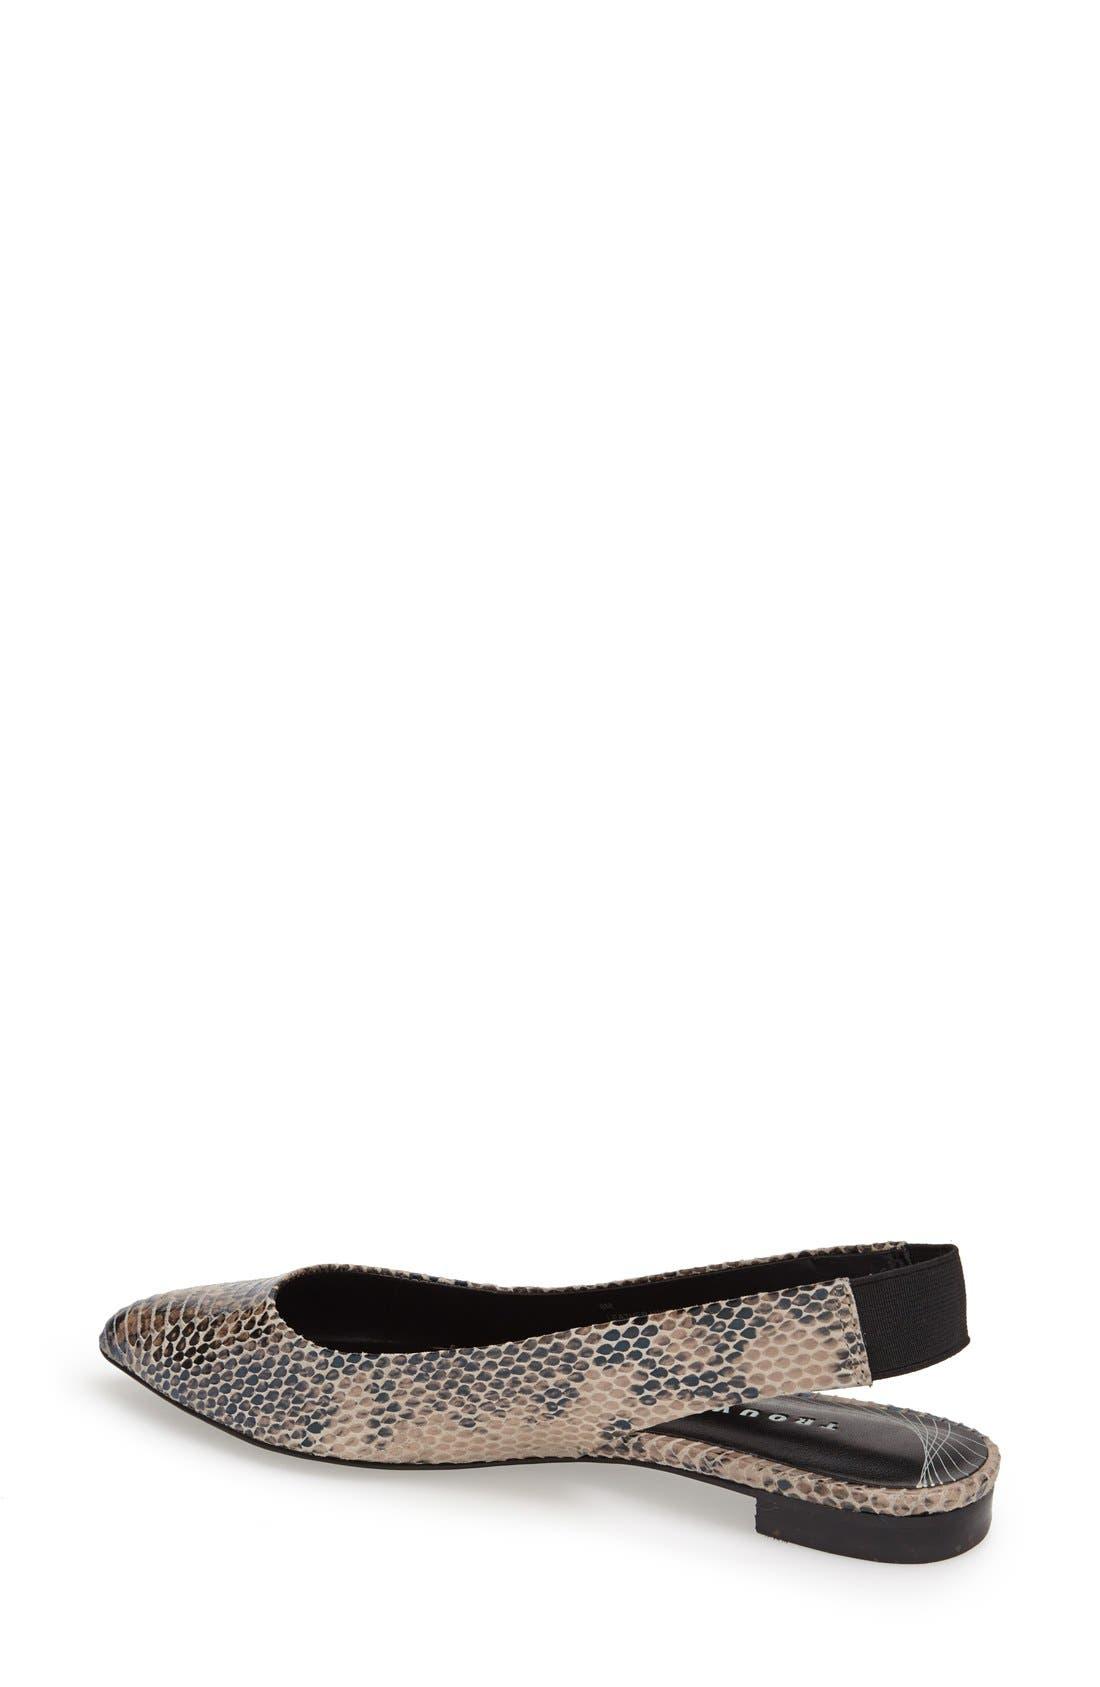 Alternate Image 2  - Trouvé 'Mona' Pointy Toe Leather Flat (Women)